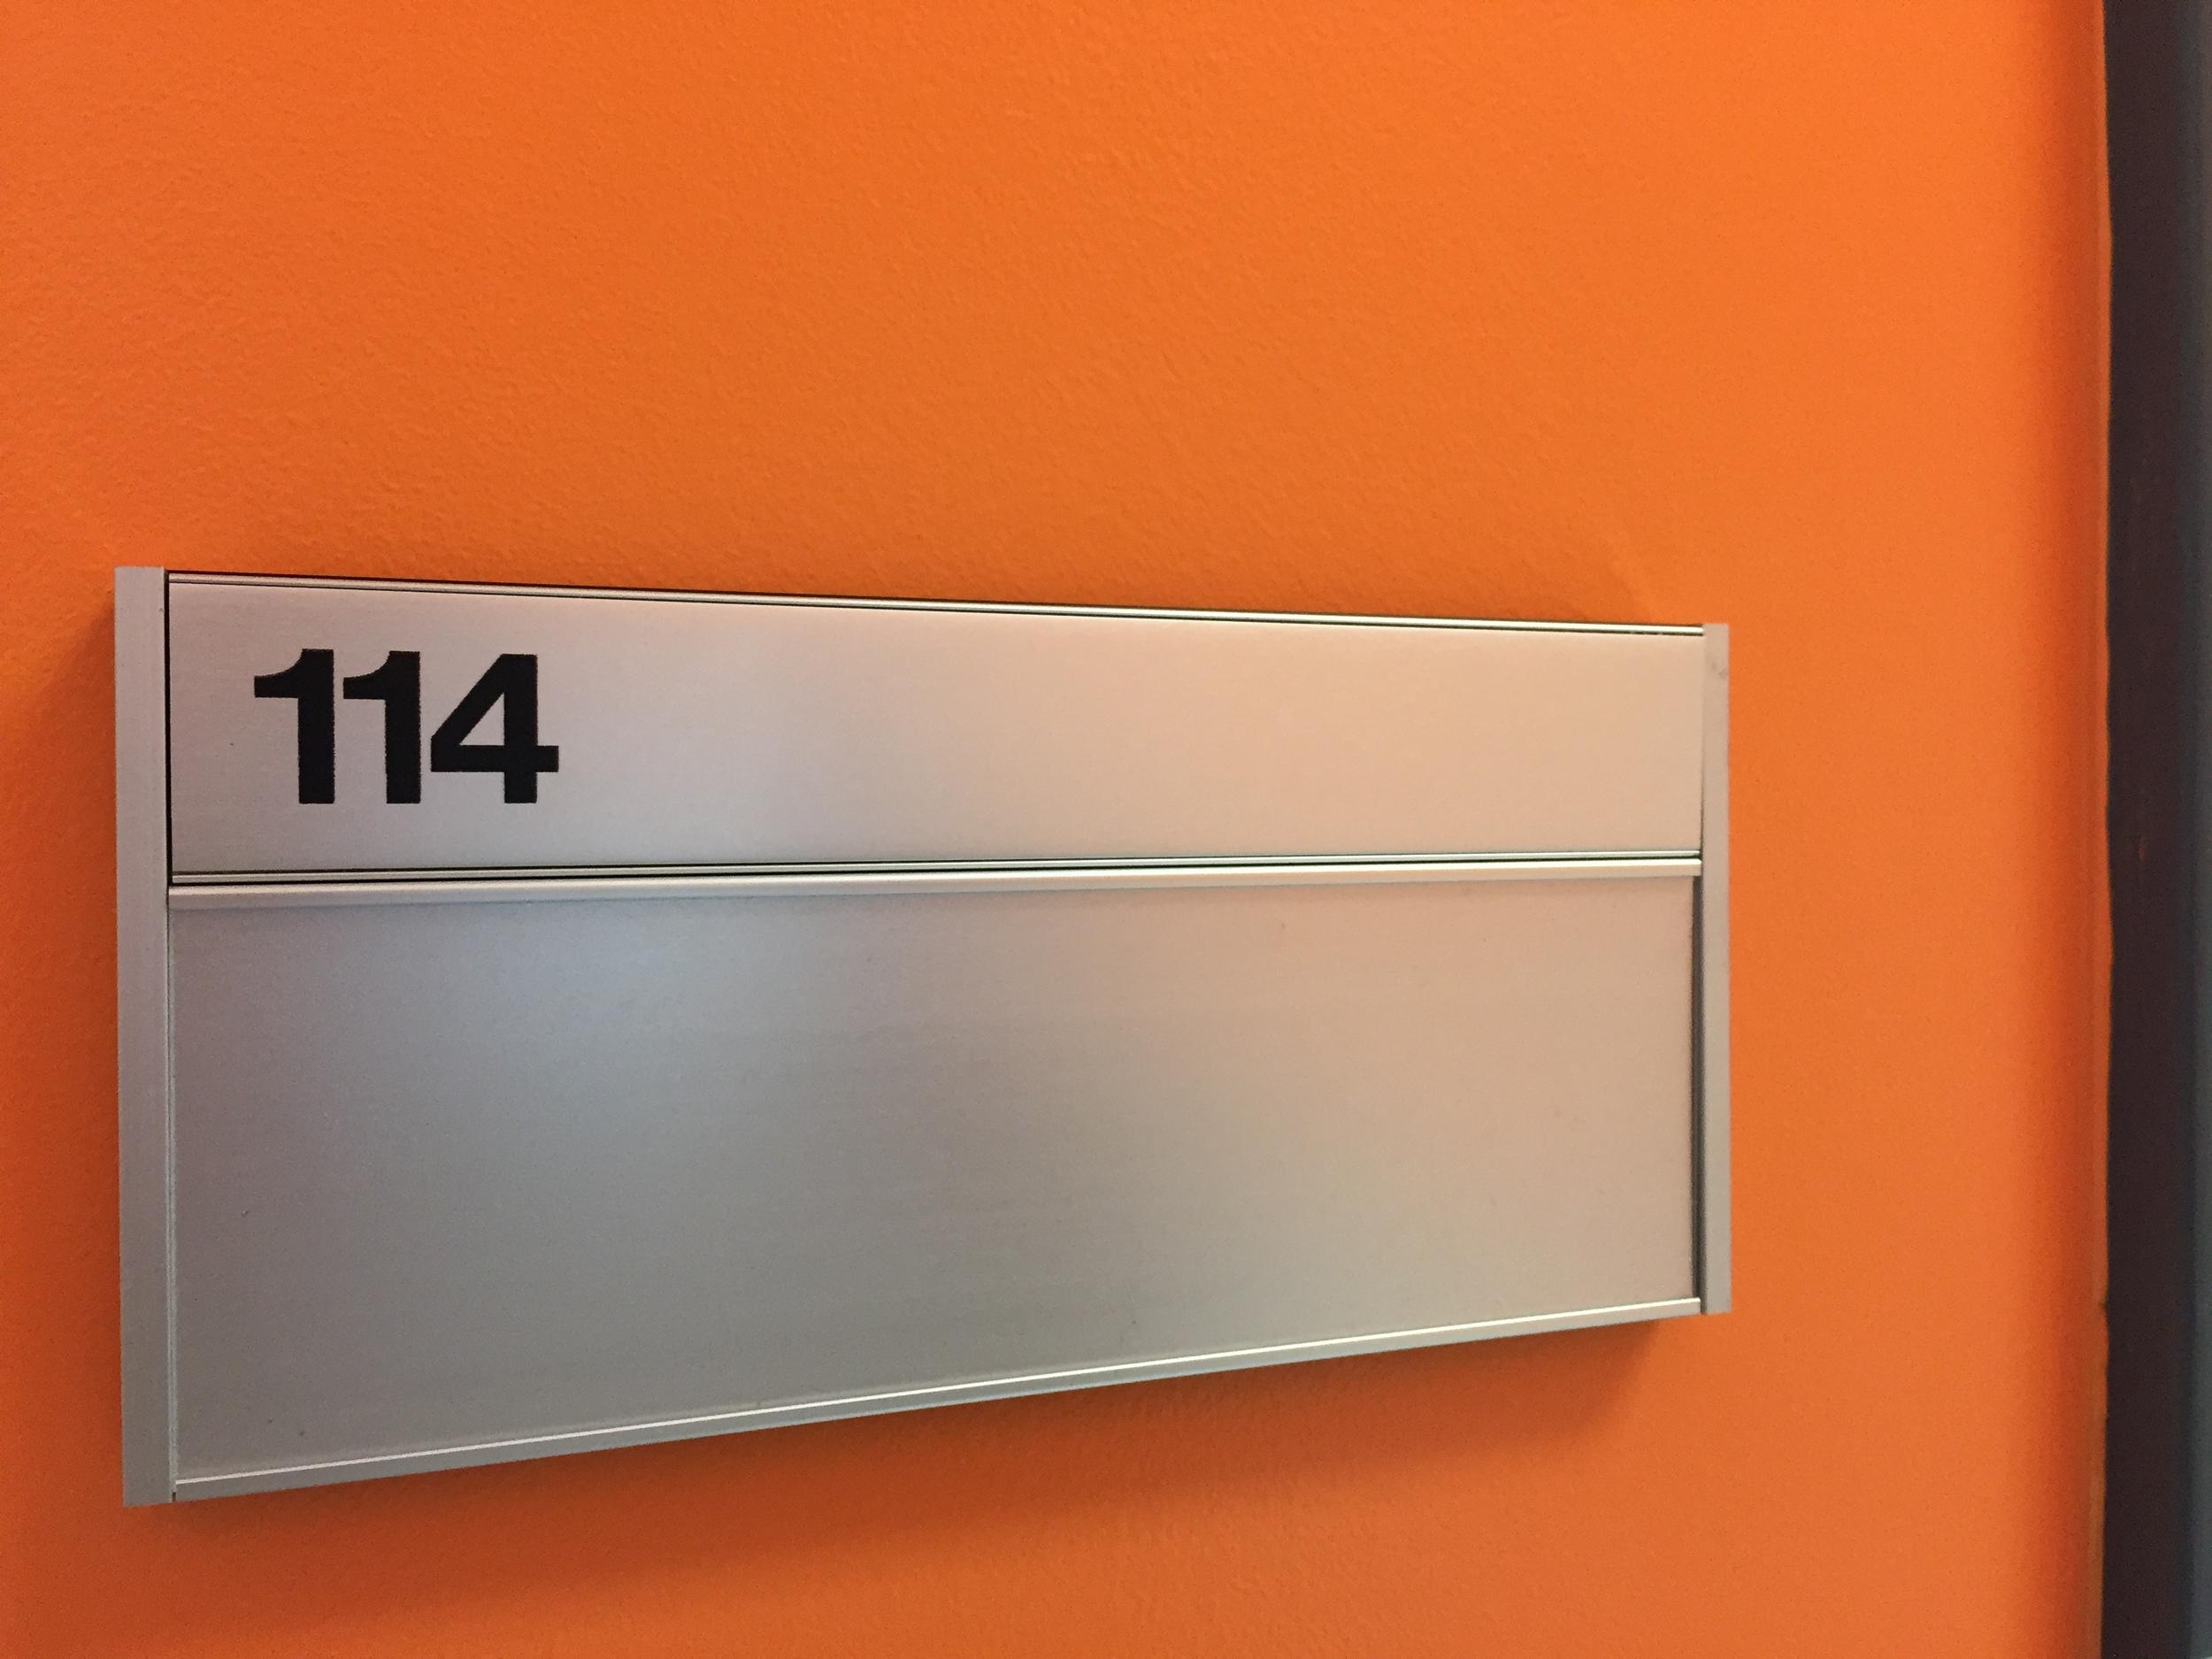 T2 Room Sign.JPG